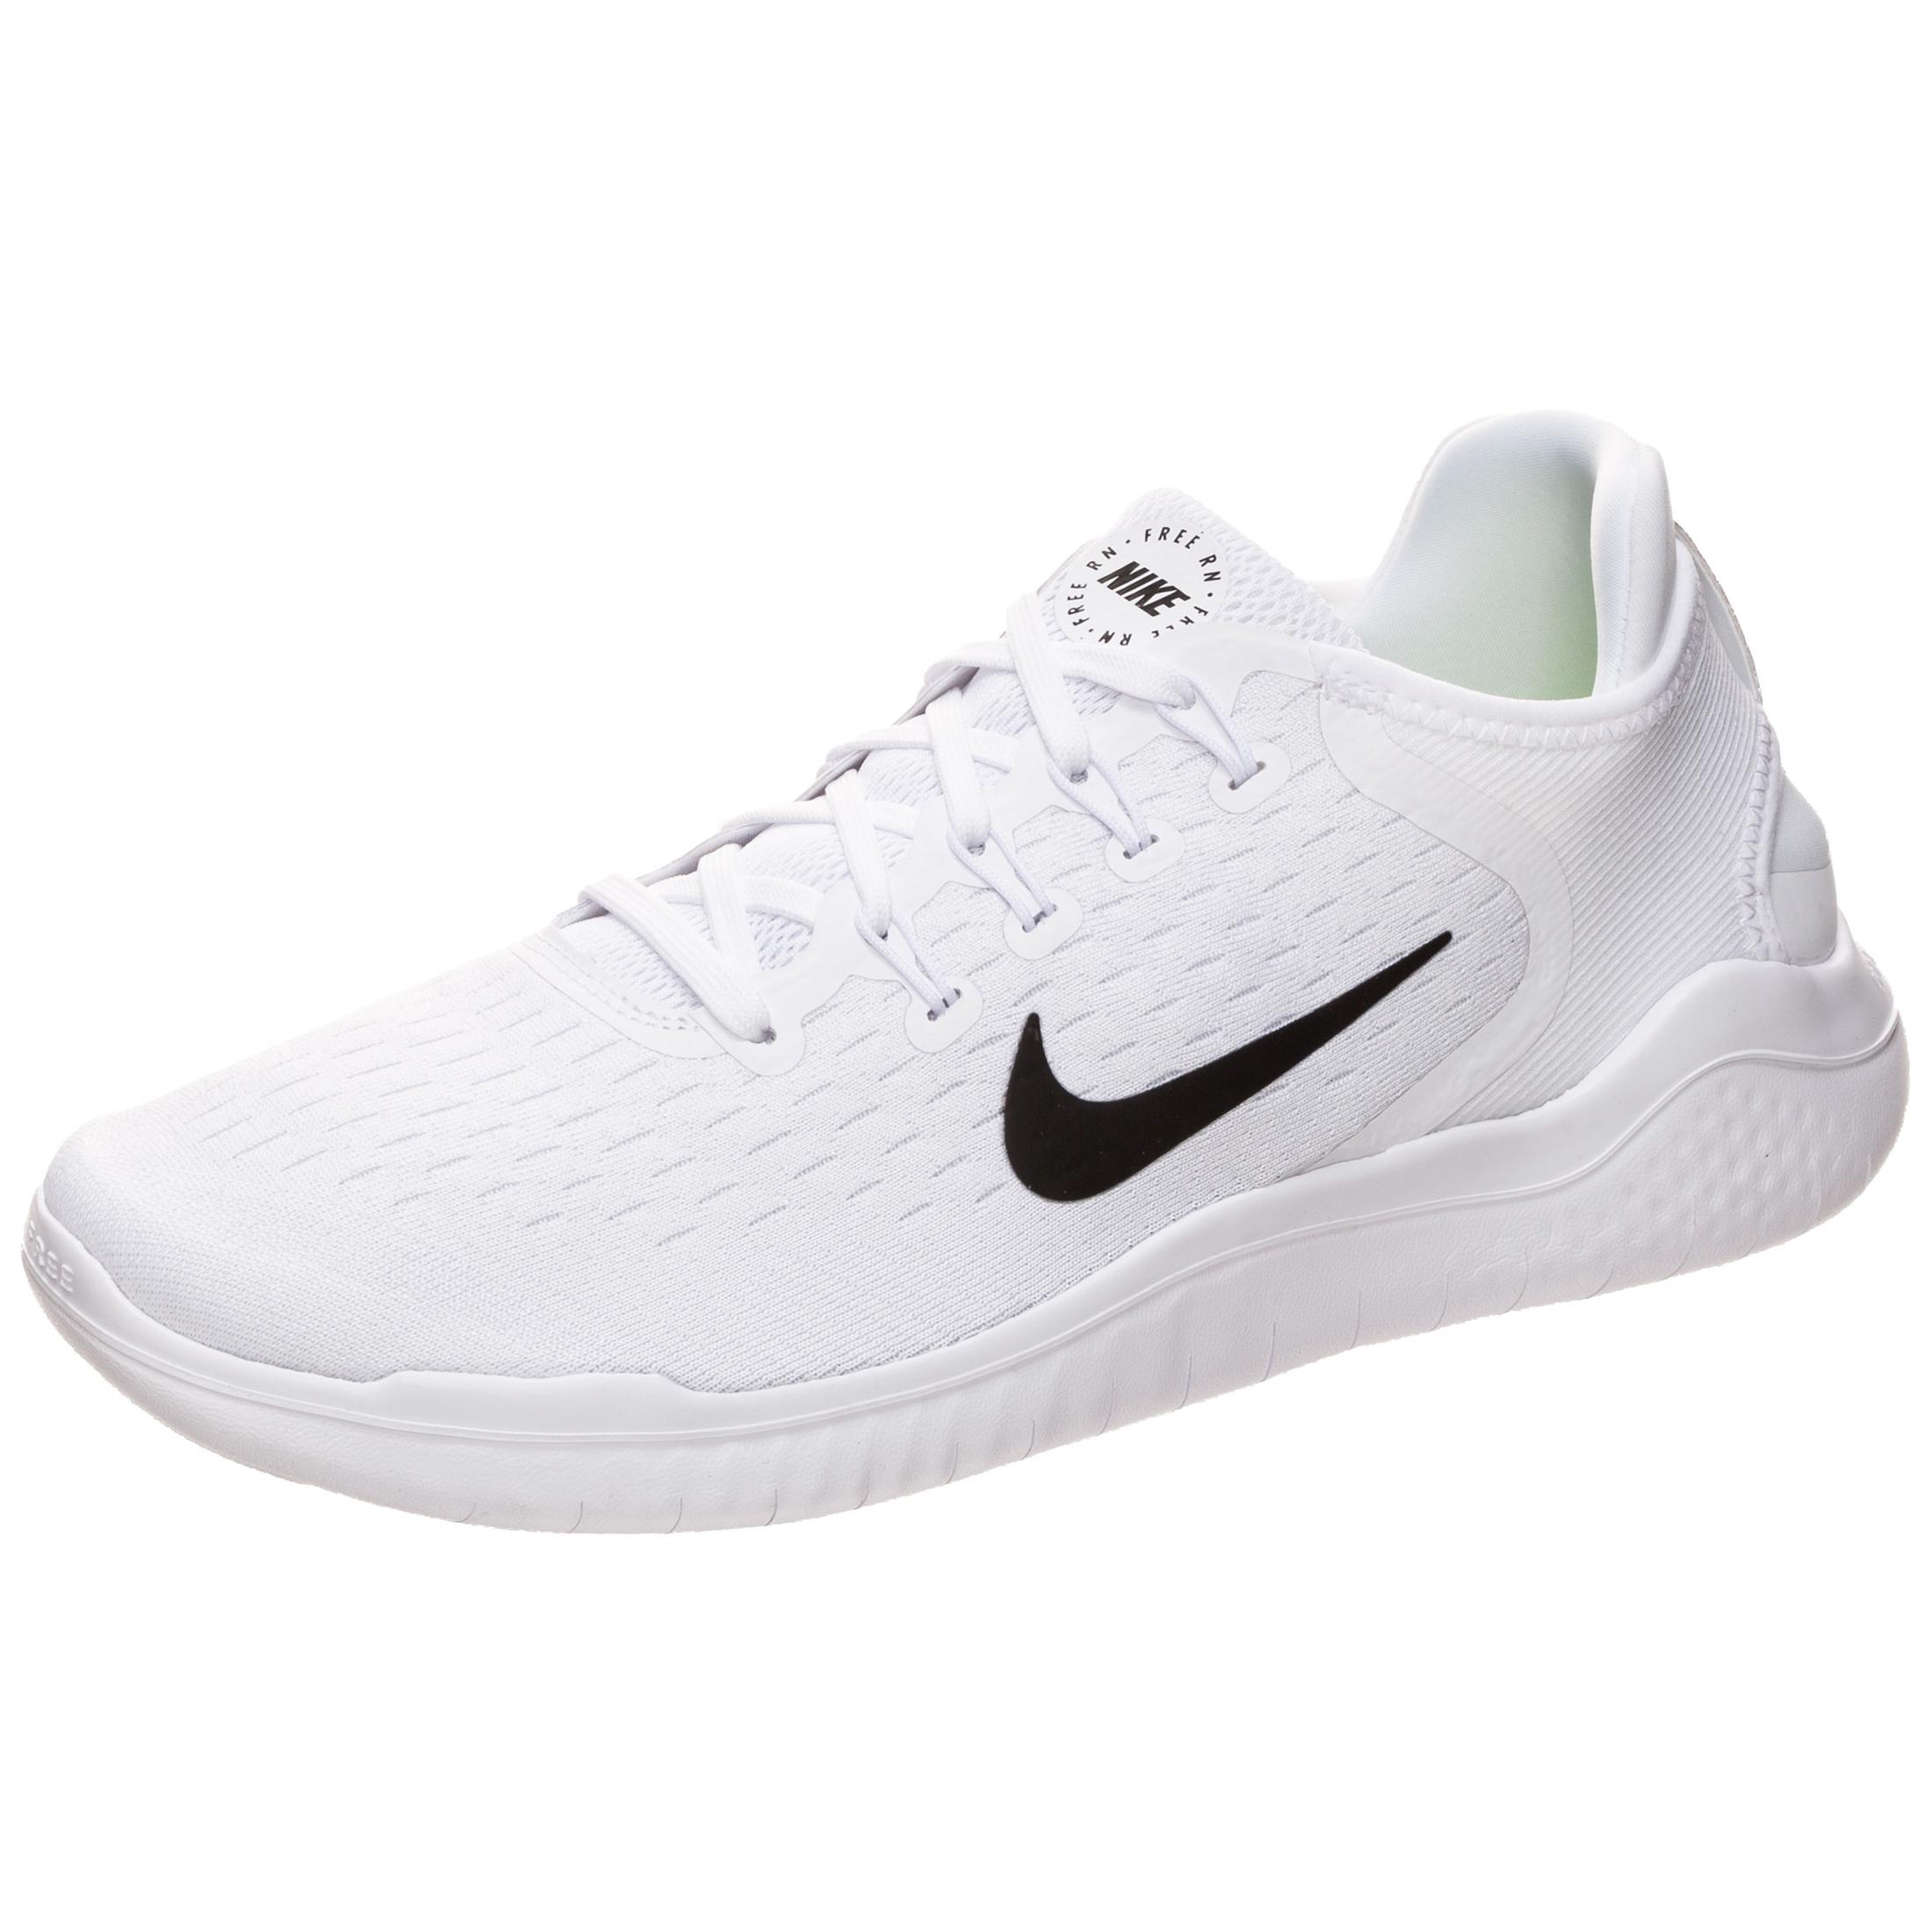 the latest d2f88 c9873 Nike Free RN 2018 Men's Running Shoe - White